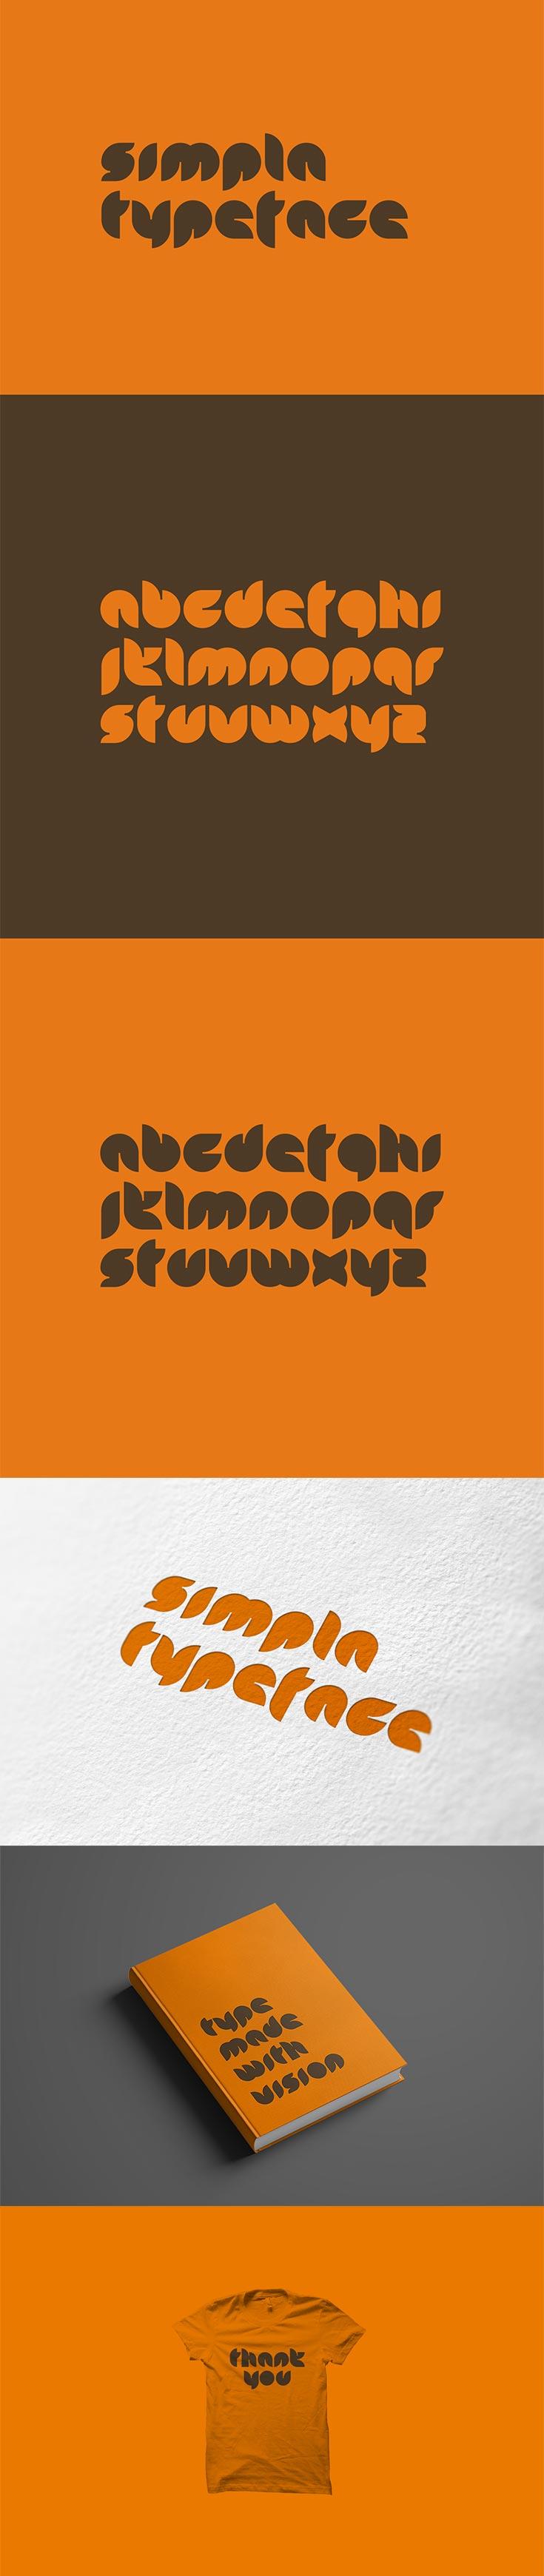 Free Simpla Decorative Typeface